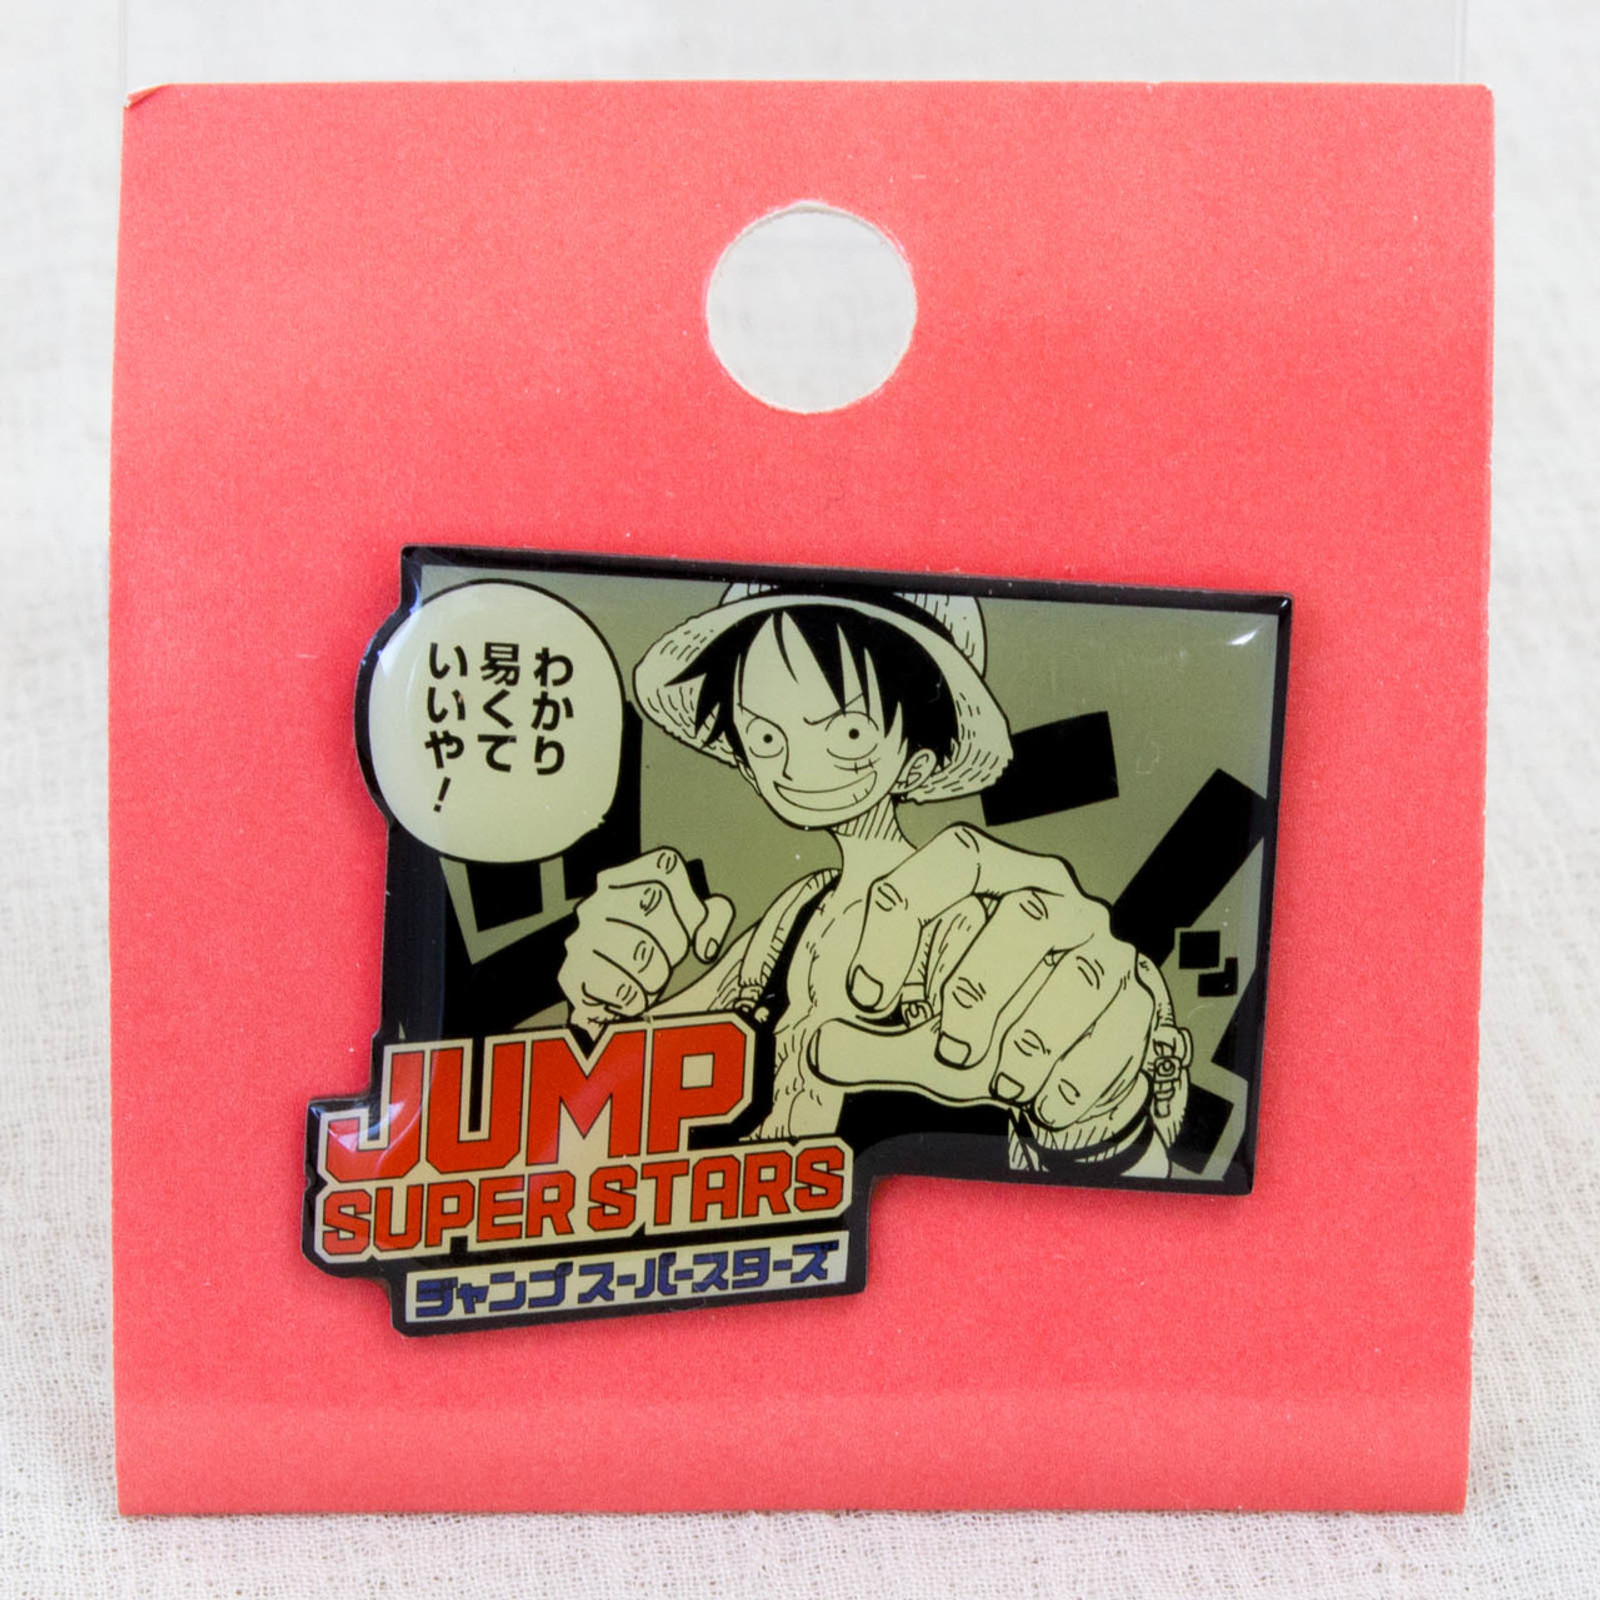 Shonen Jump Super Stars Pins ONE PIECE Luffy JAPAN ANIME MANGA